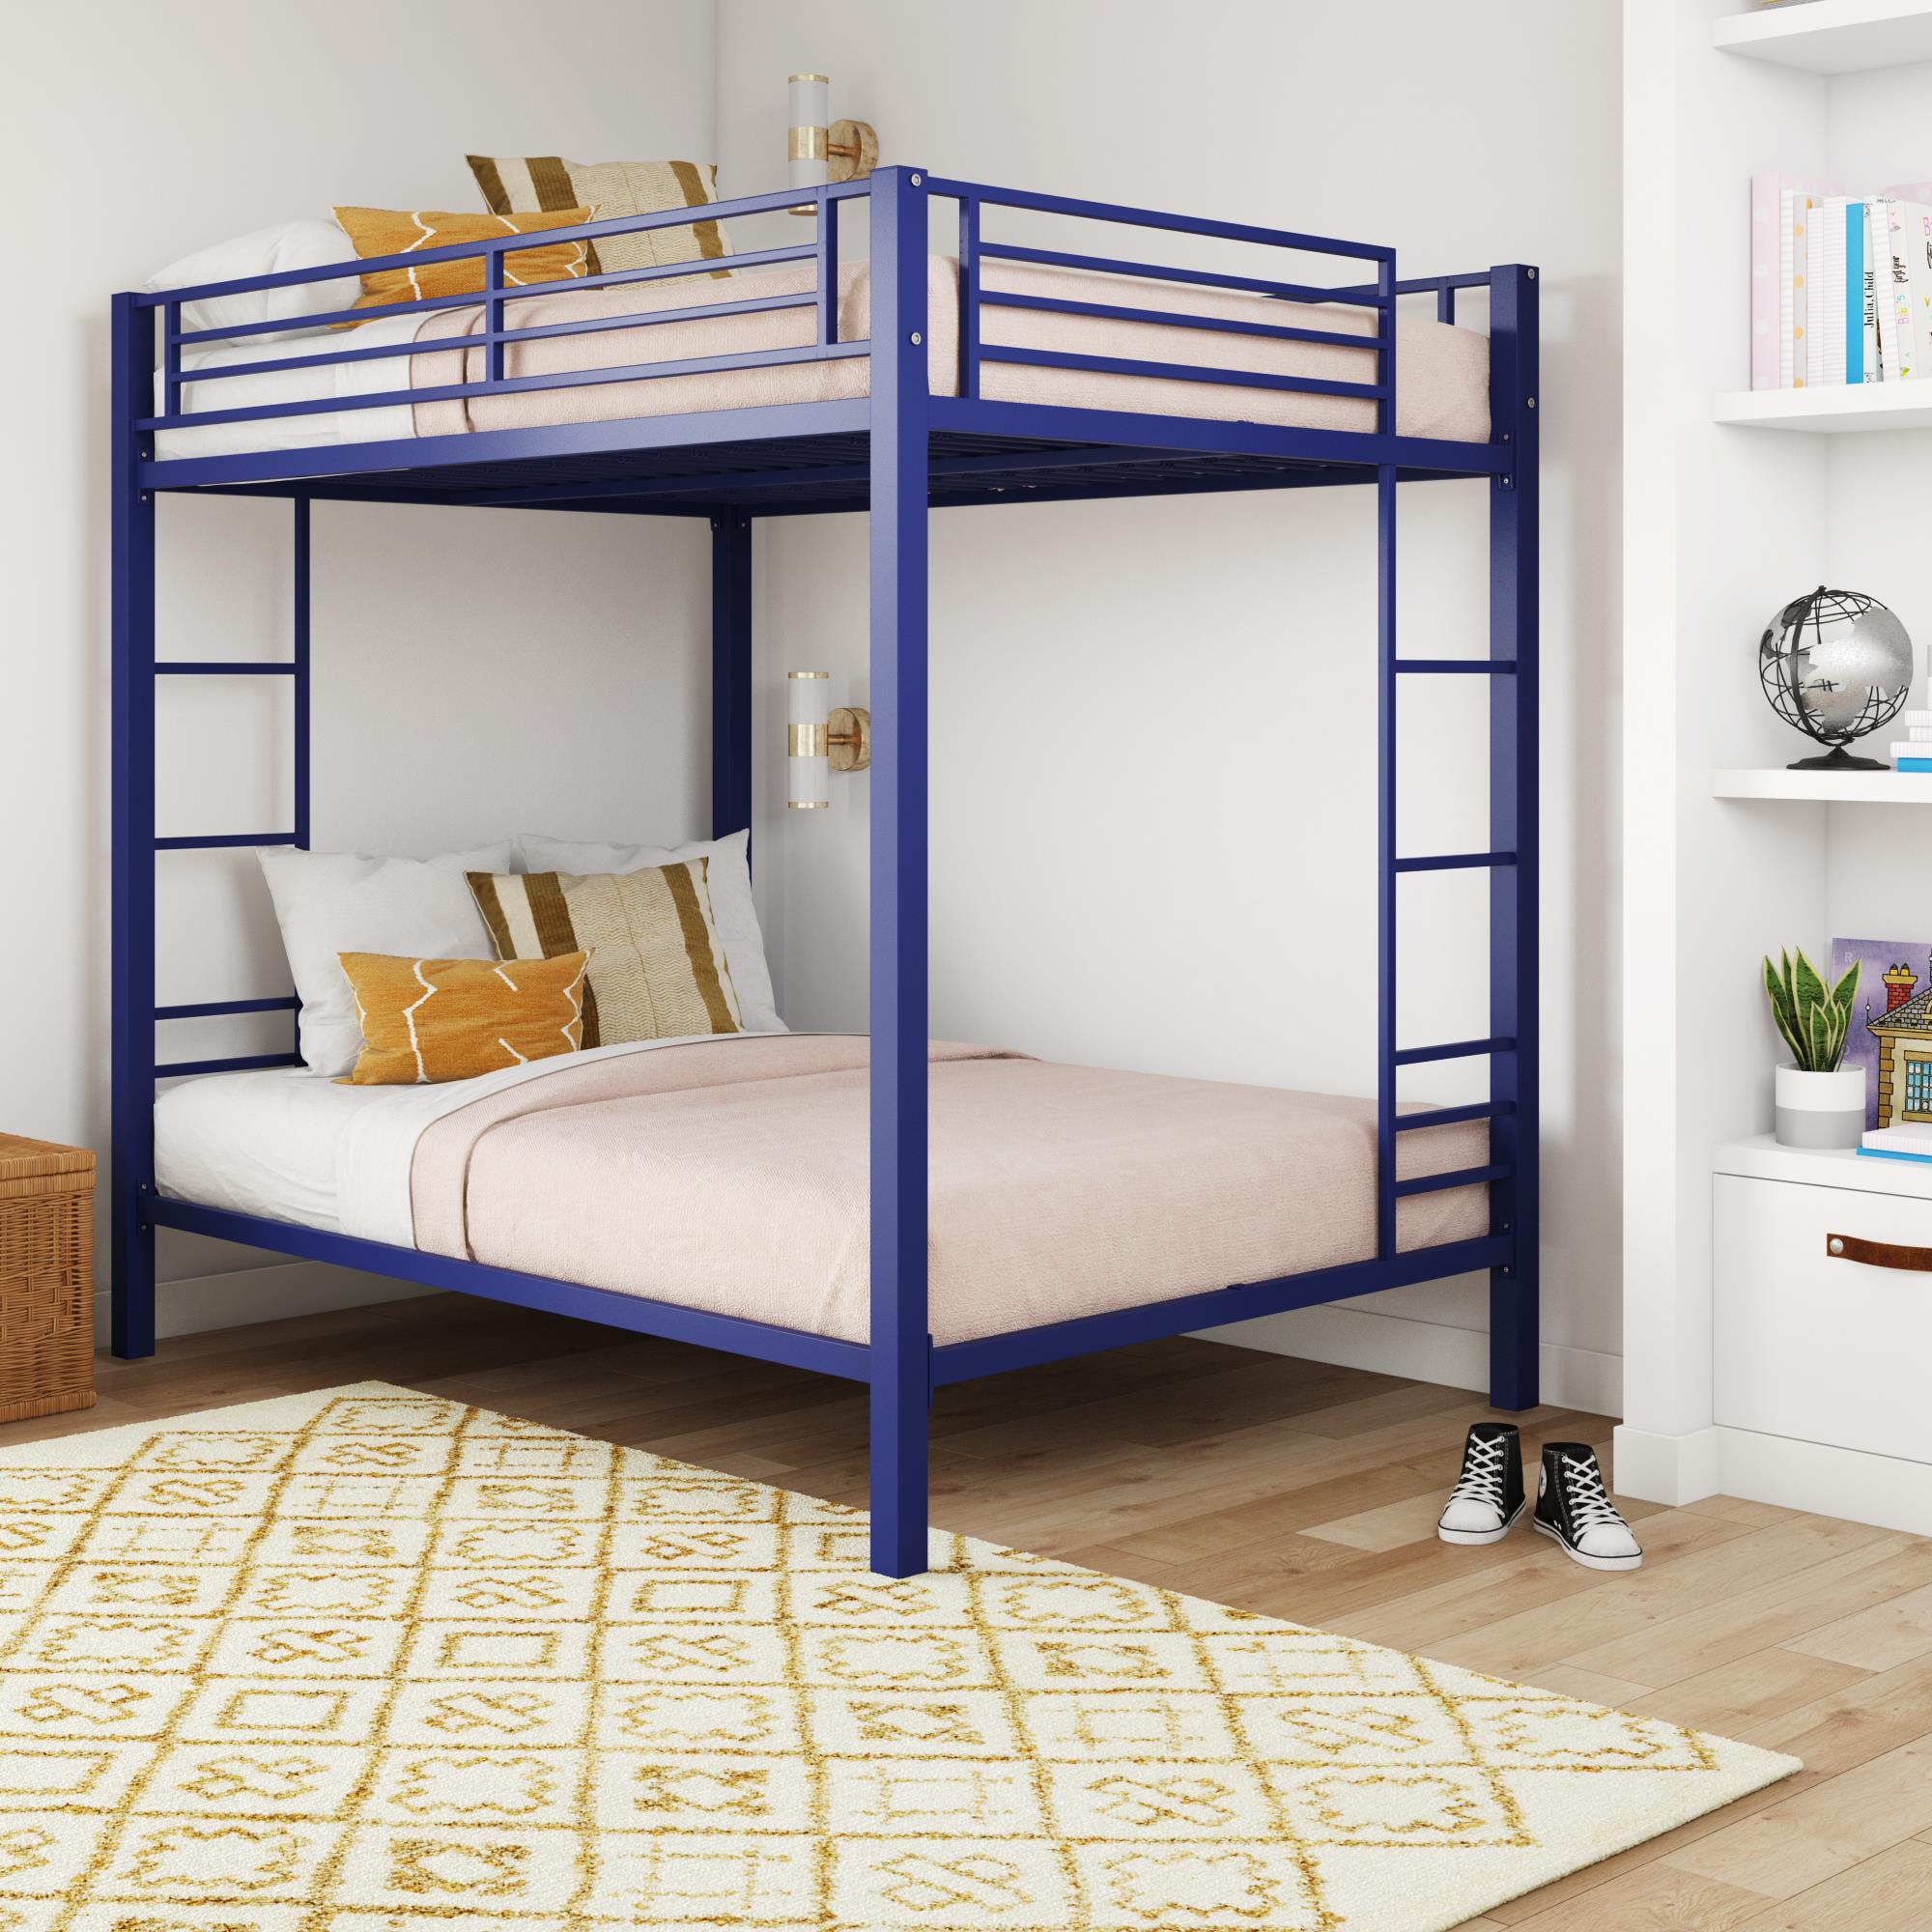 Dhp Full Over Full Bunk Bed For Kids Metal Frame With Ladder Blue Walmart Com Walmart Com